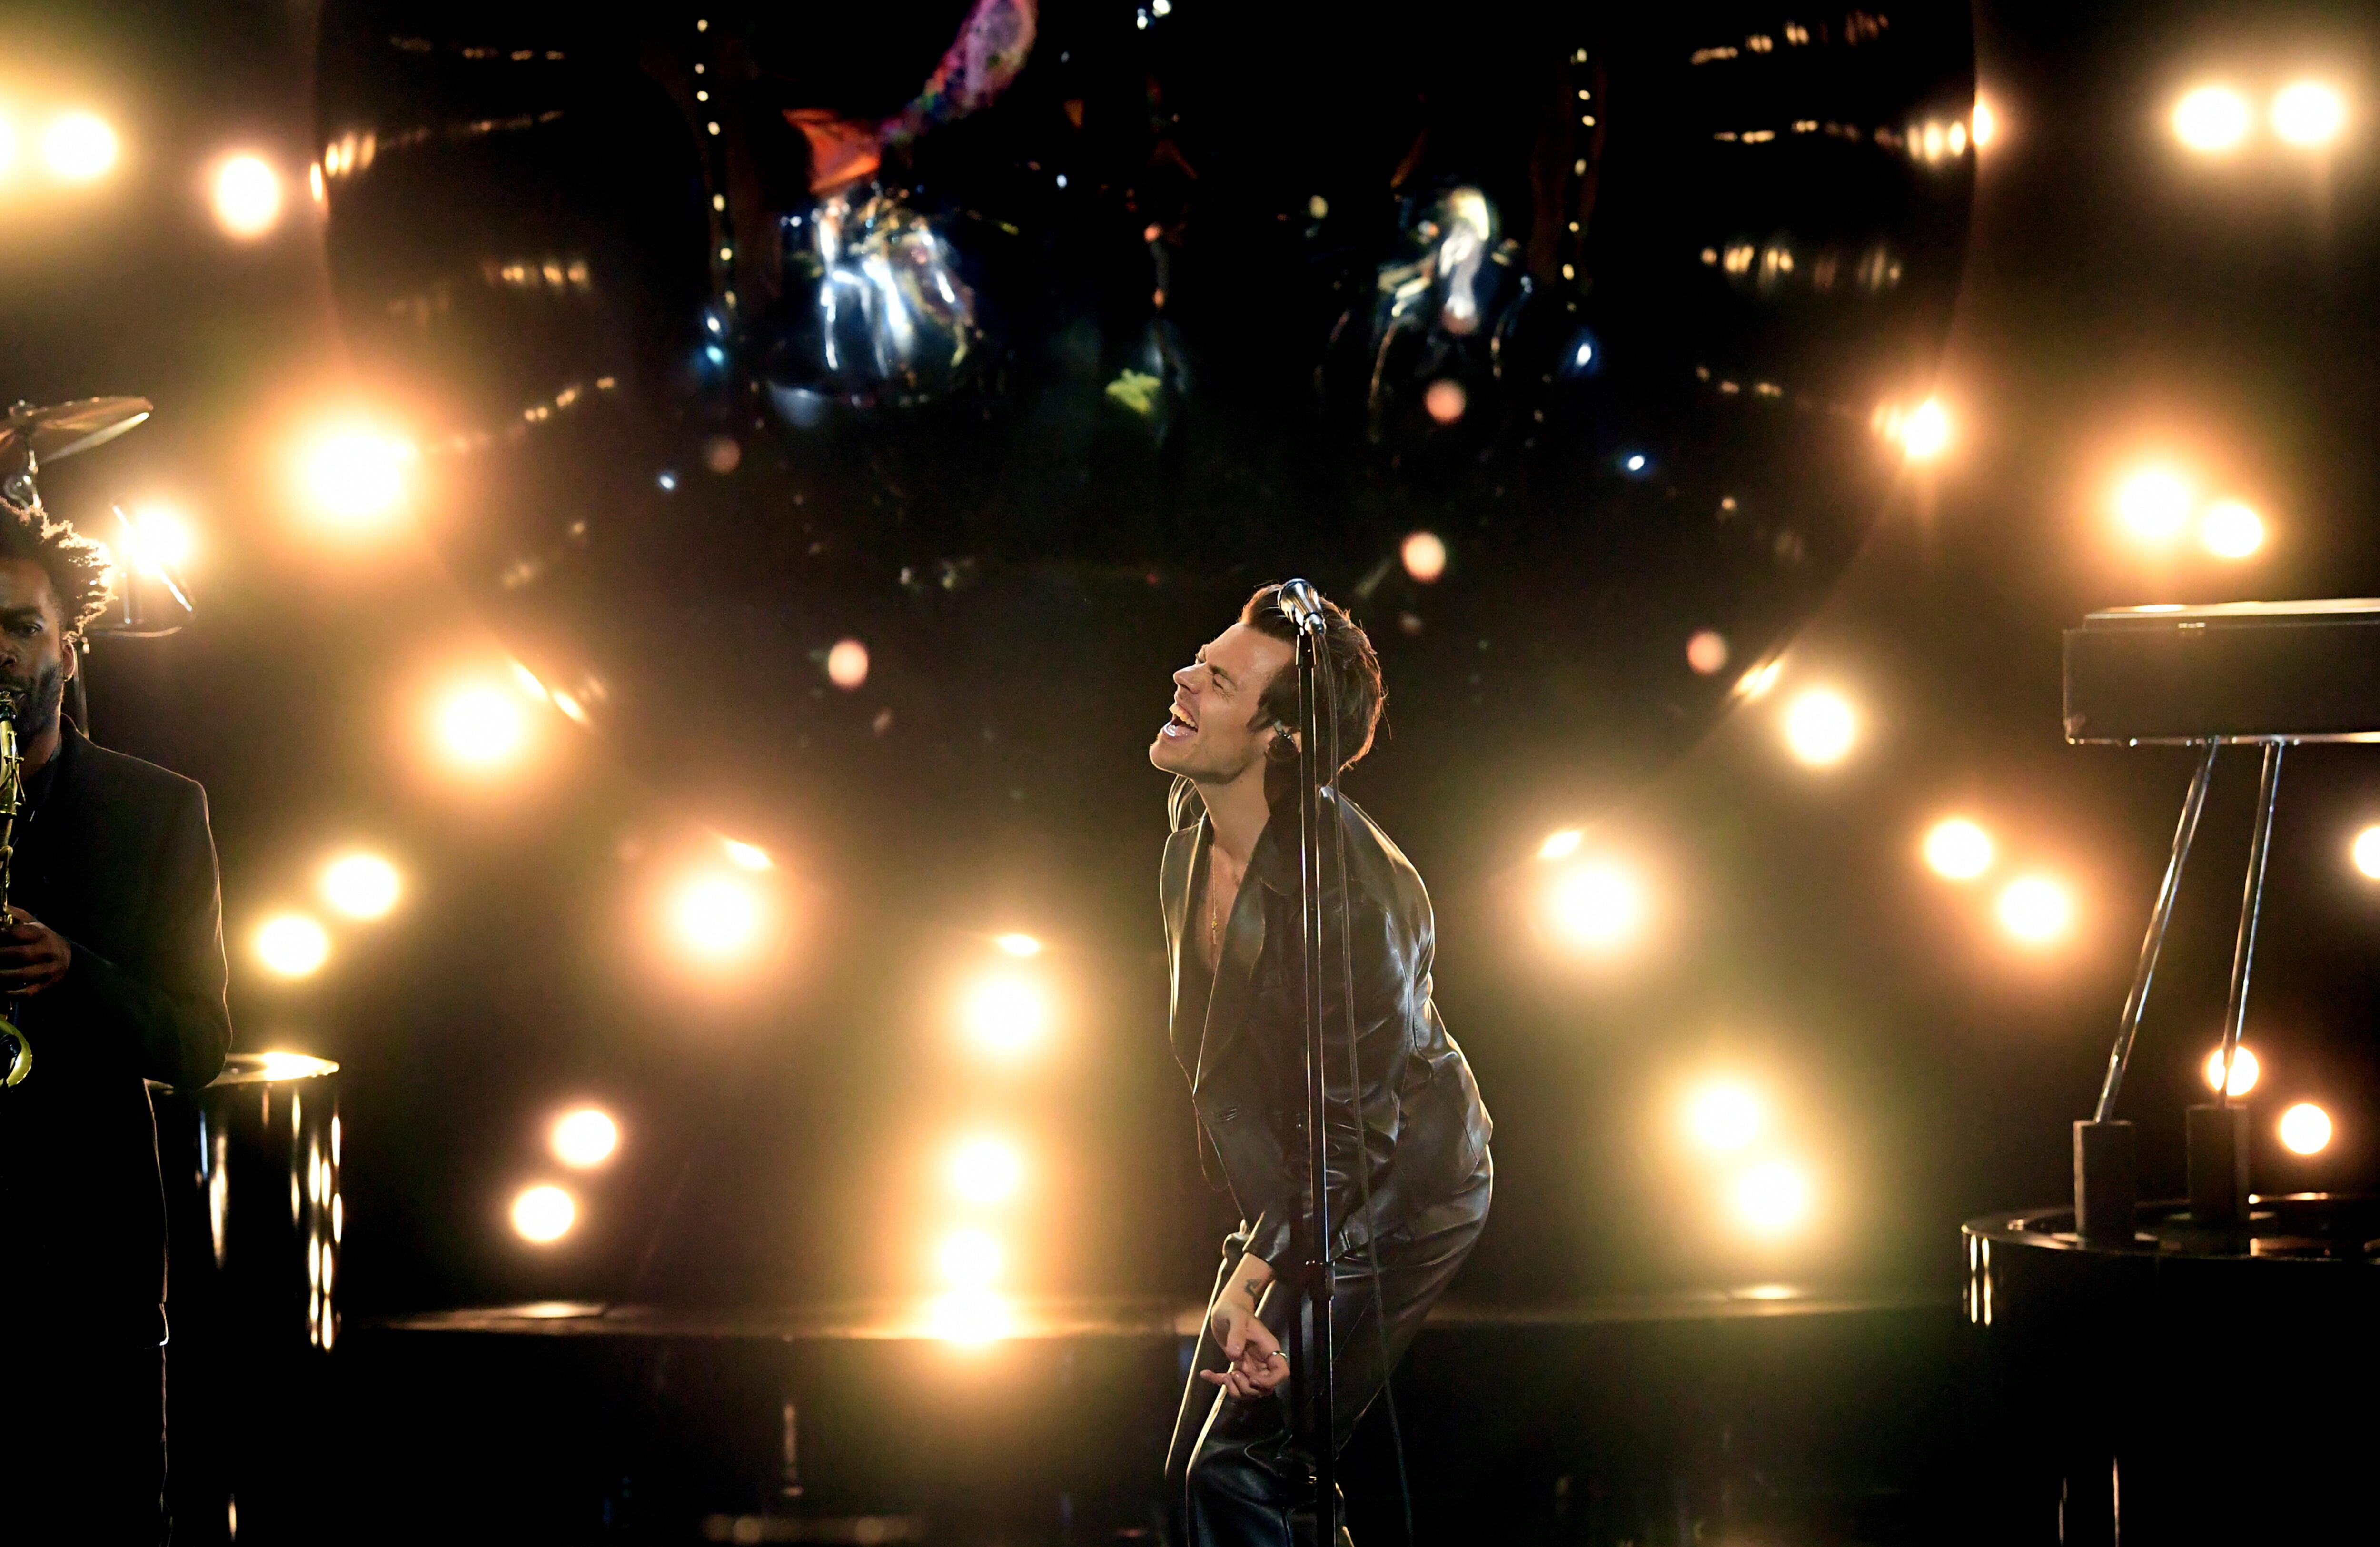 Harry Styles announces new 'Love On Tour' dates